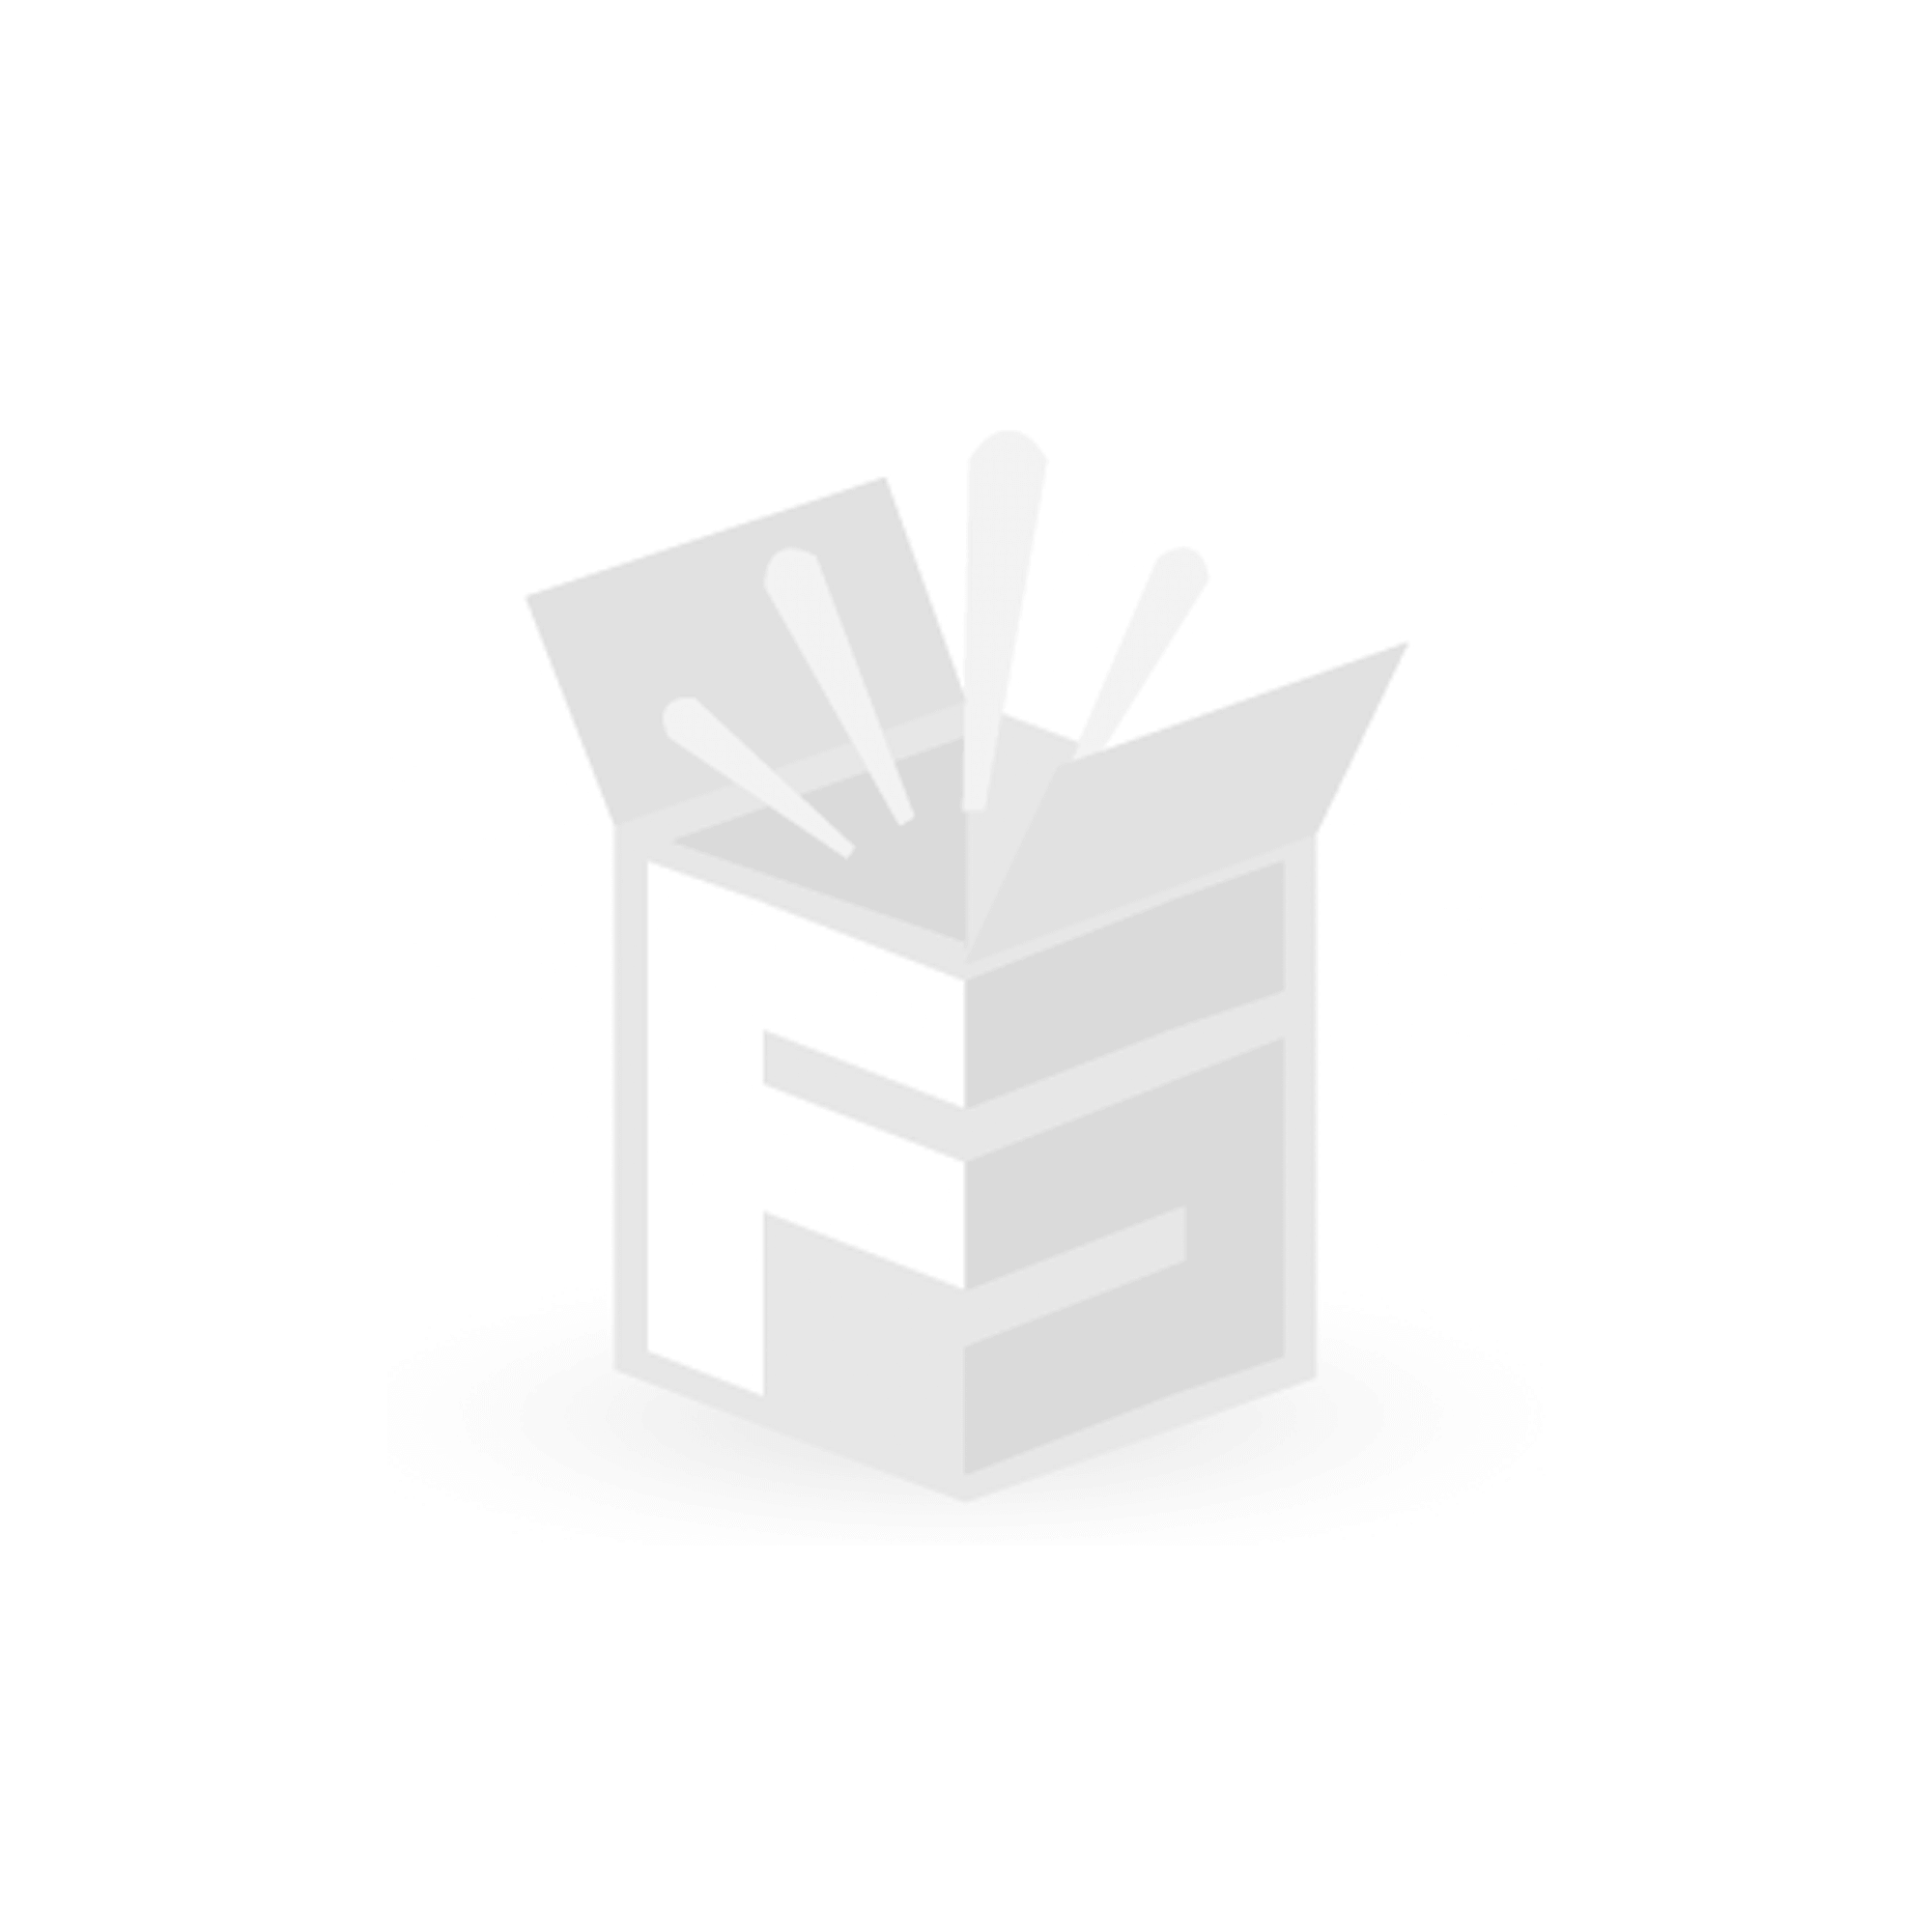 WMF Caipirinha-Set 2 Gläser + 1 Stössel + 30 Trinkhalme